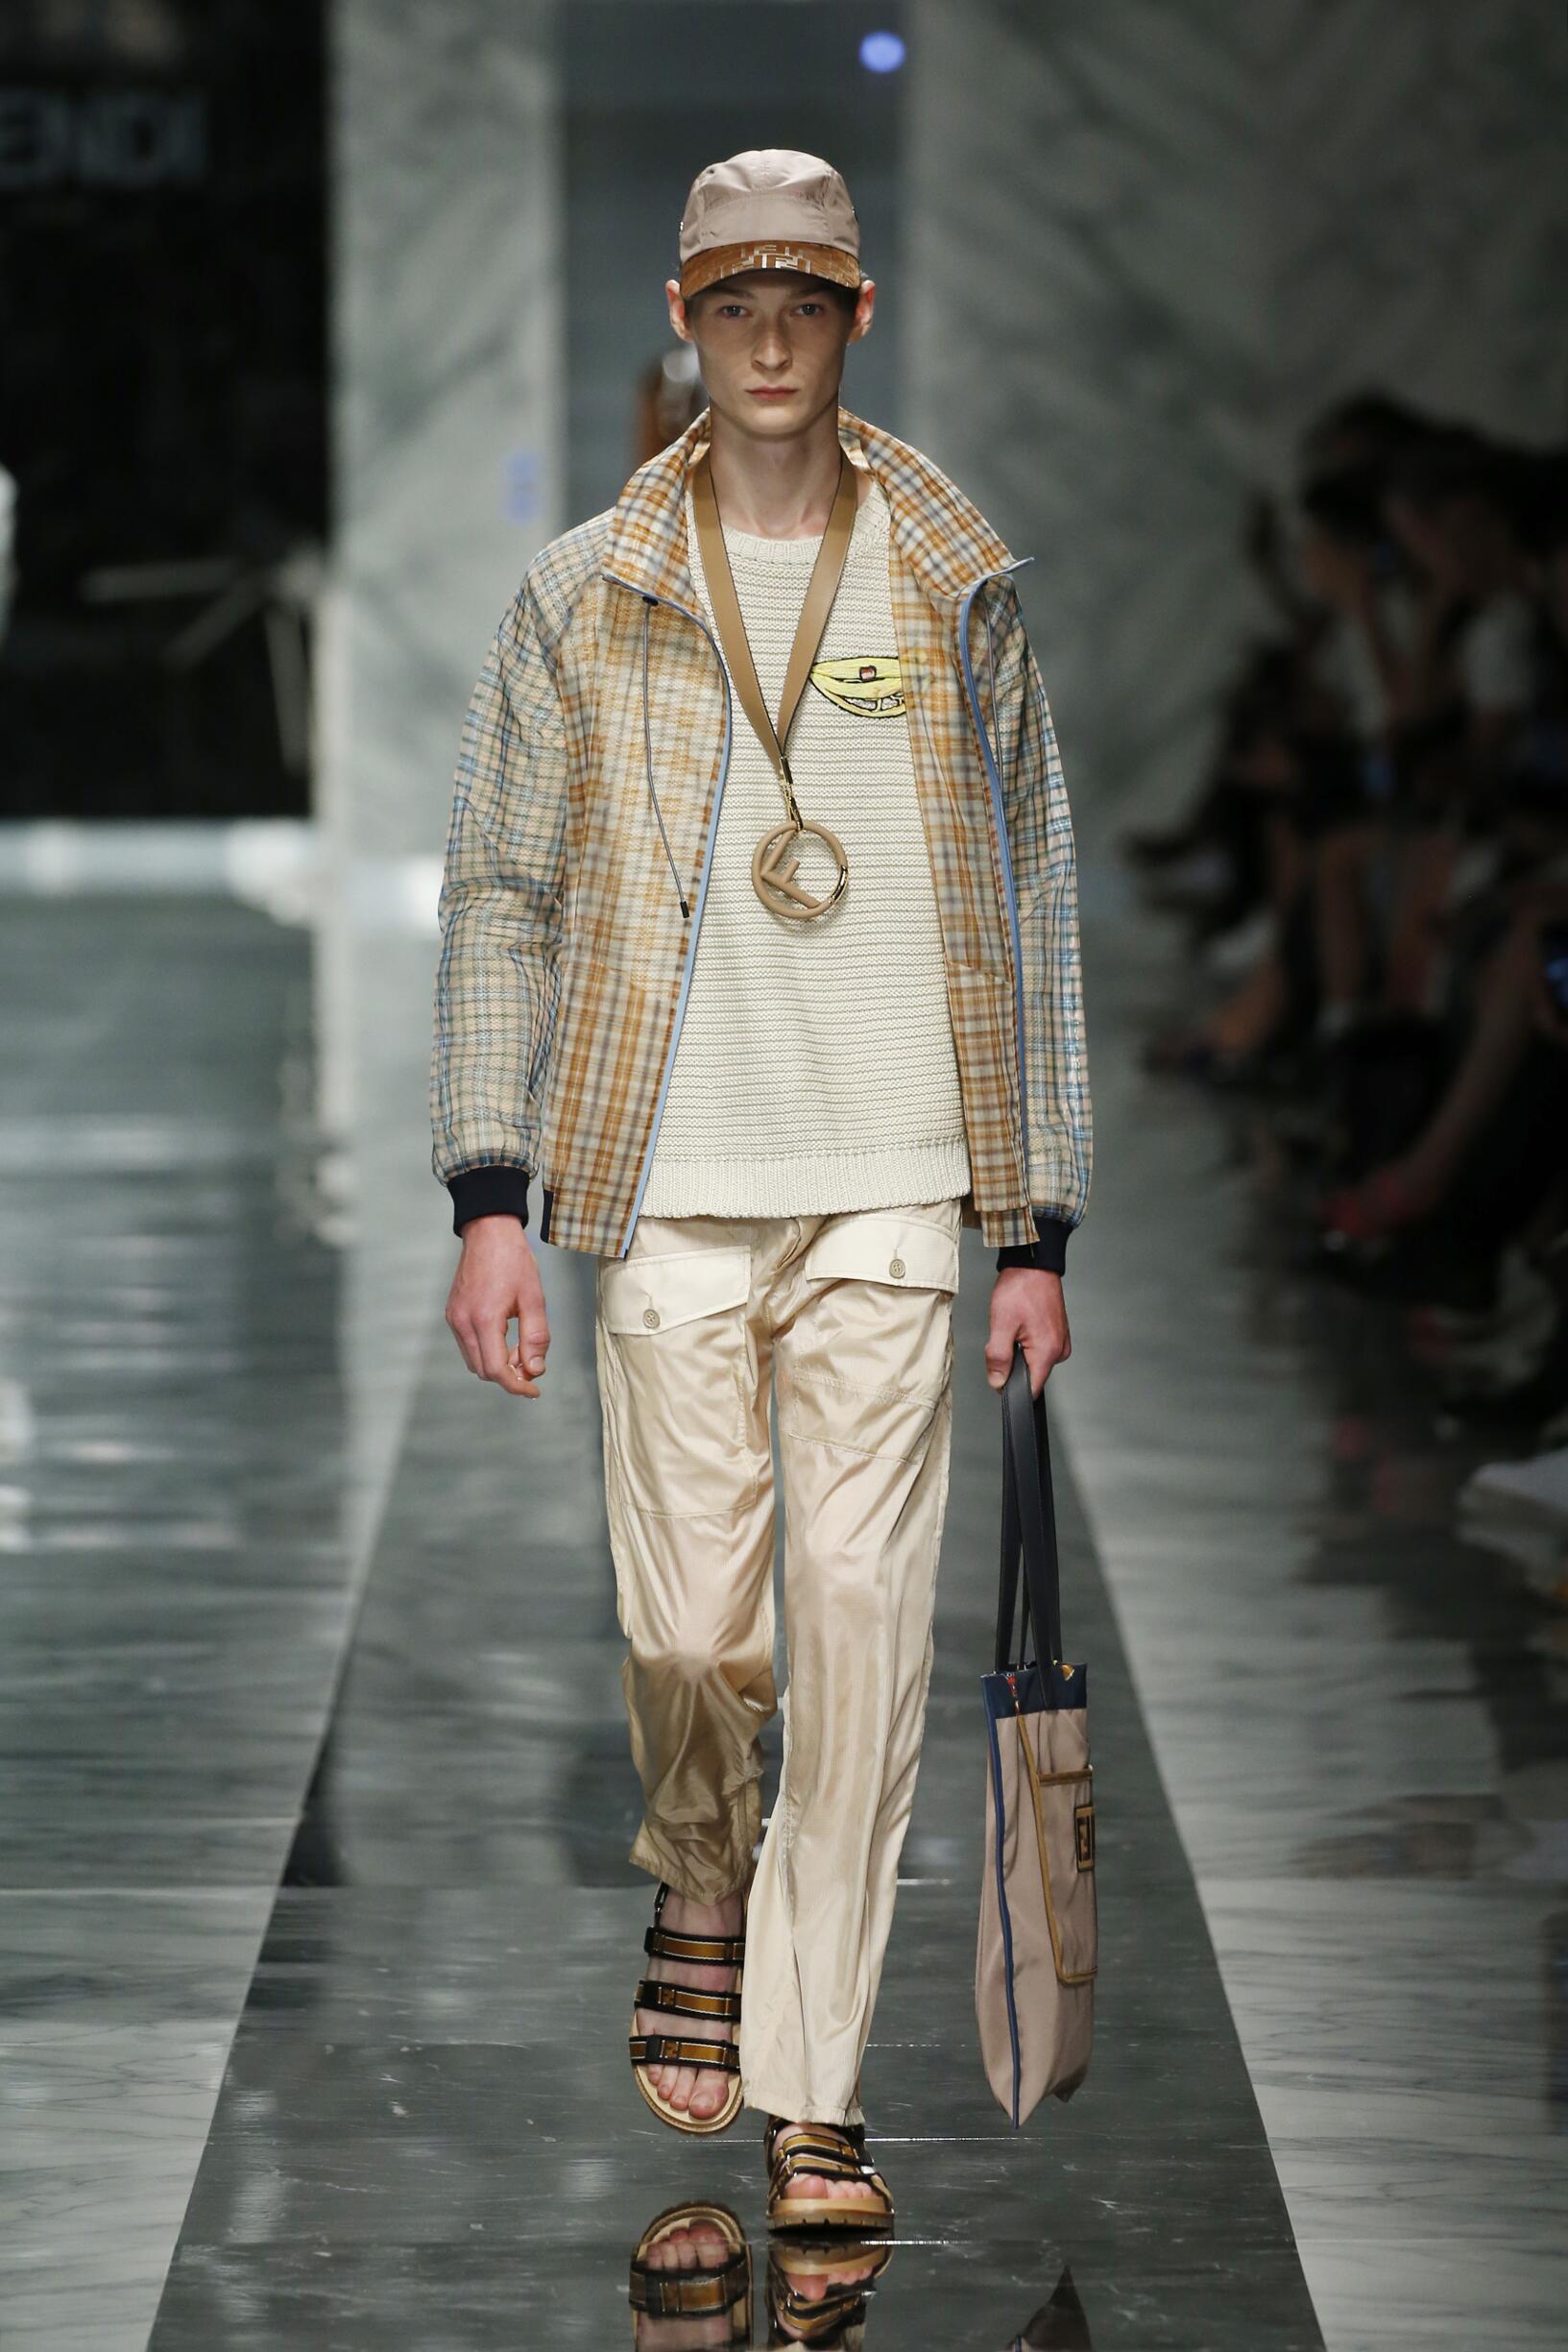 Spring Fashion Trends 2018 Fendi